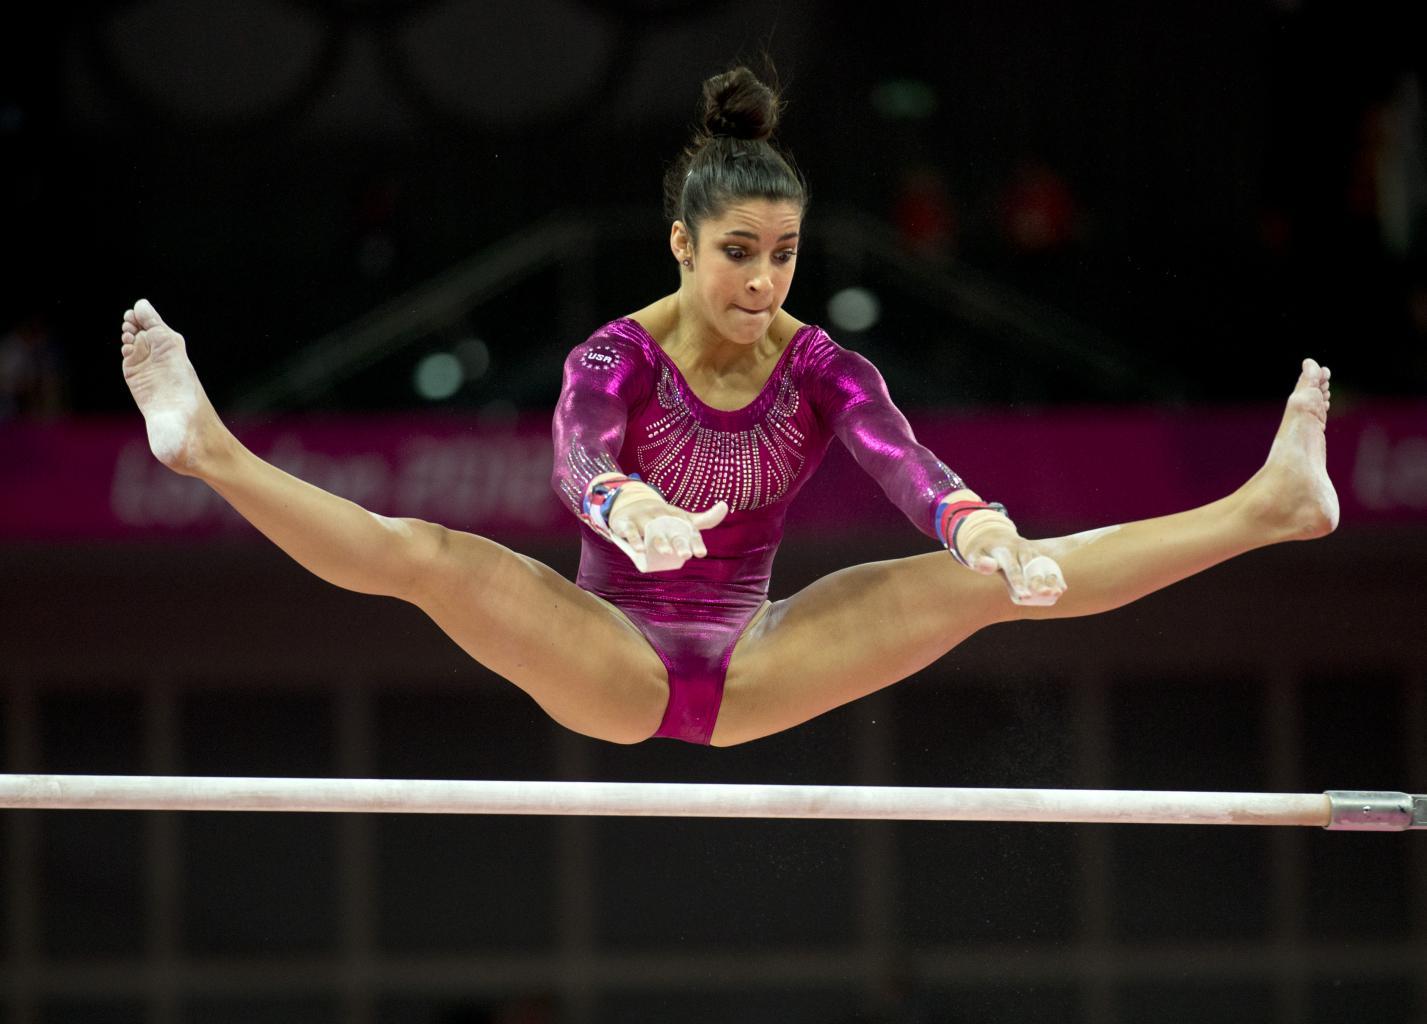 Aly Raisman (gymnast) Naked